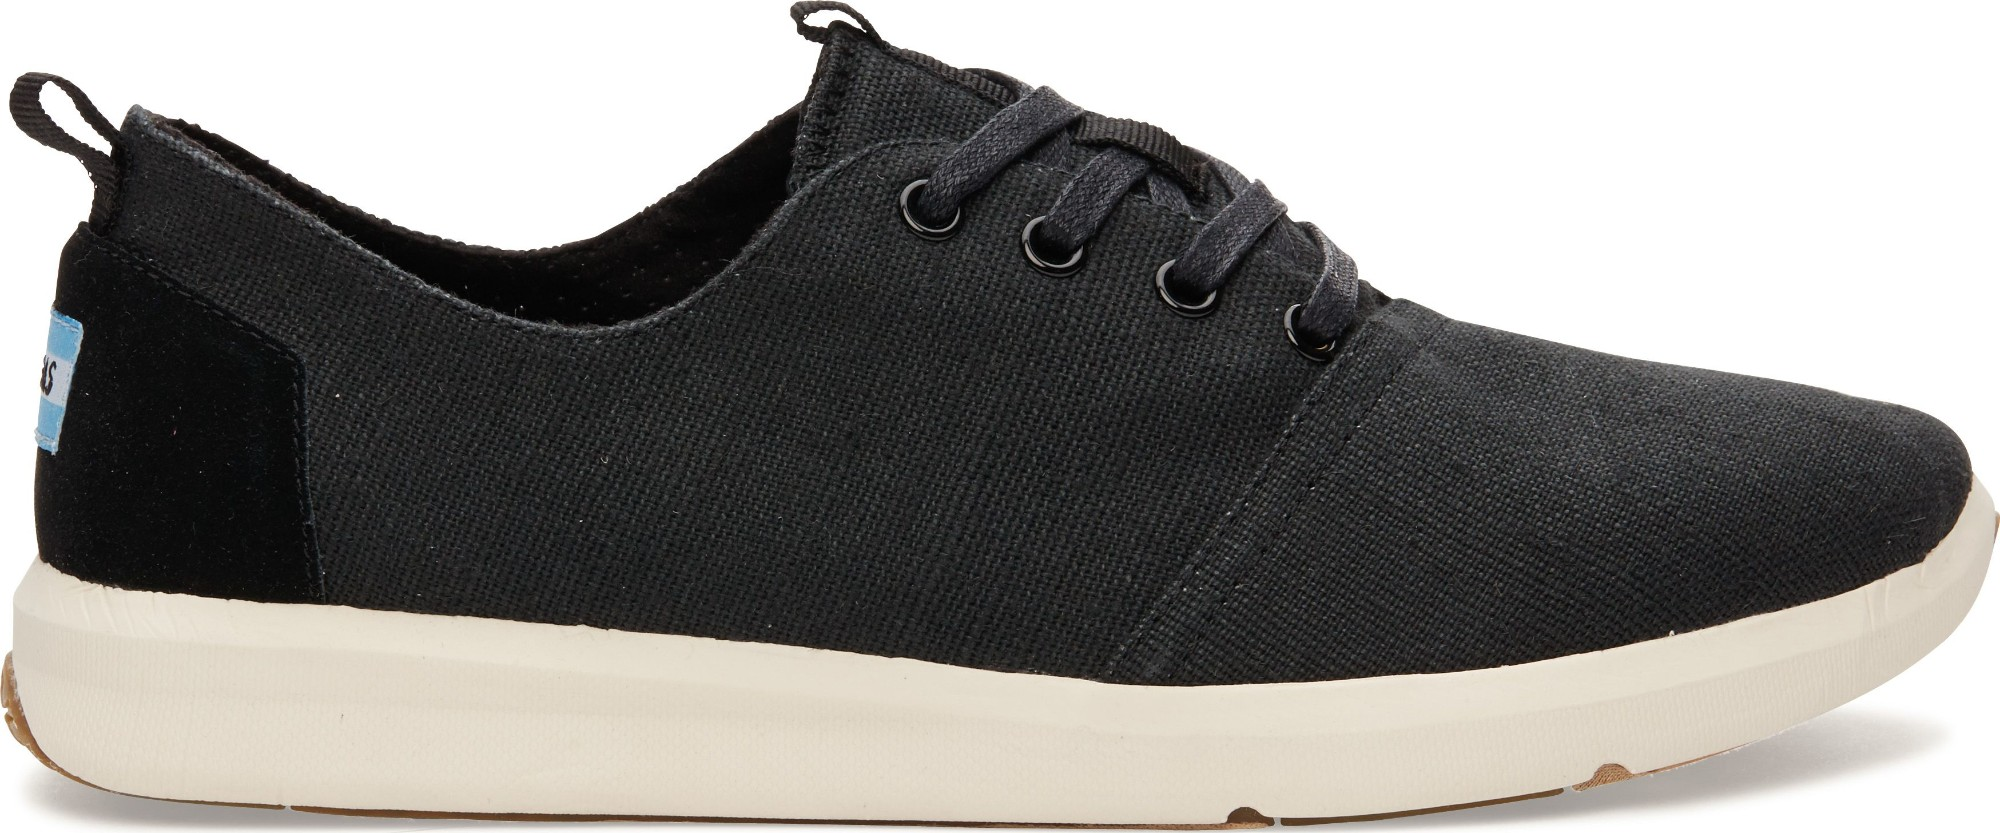 TOMS Burlap Men's Viaje Sneaker Black 41